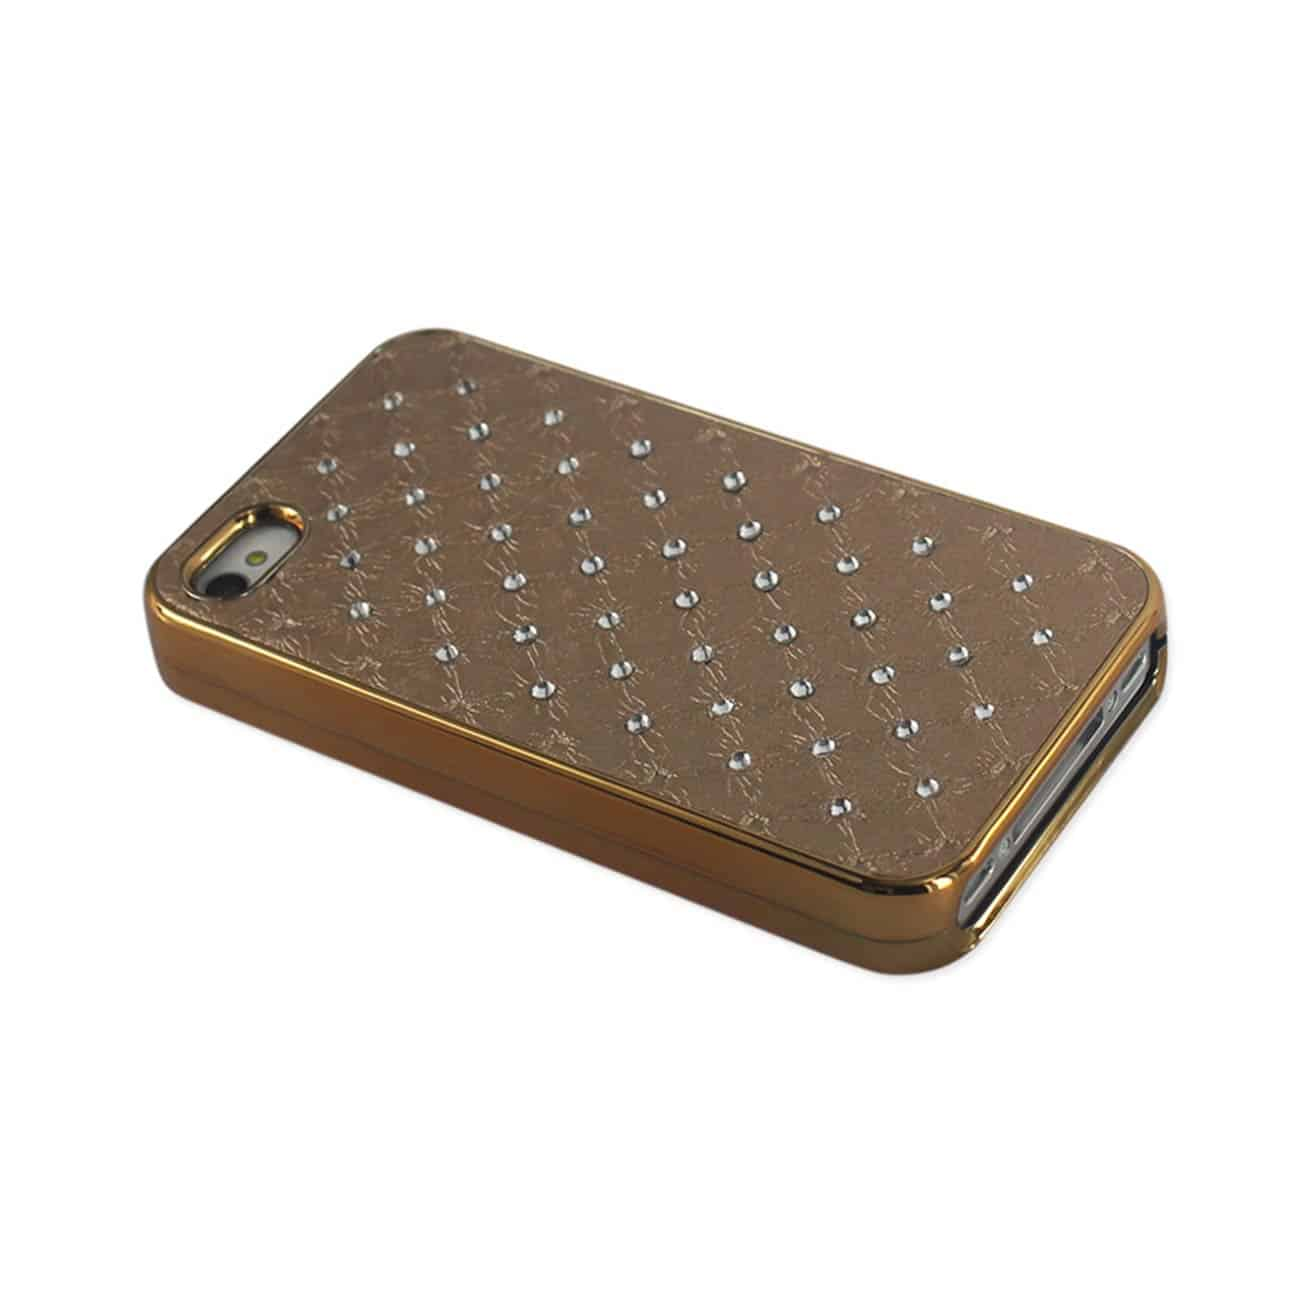 IPHONE 4G JEWELRY DIAMOND STUDS CASE IN BEIGE